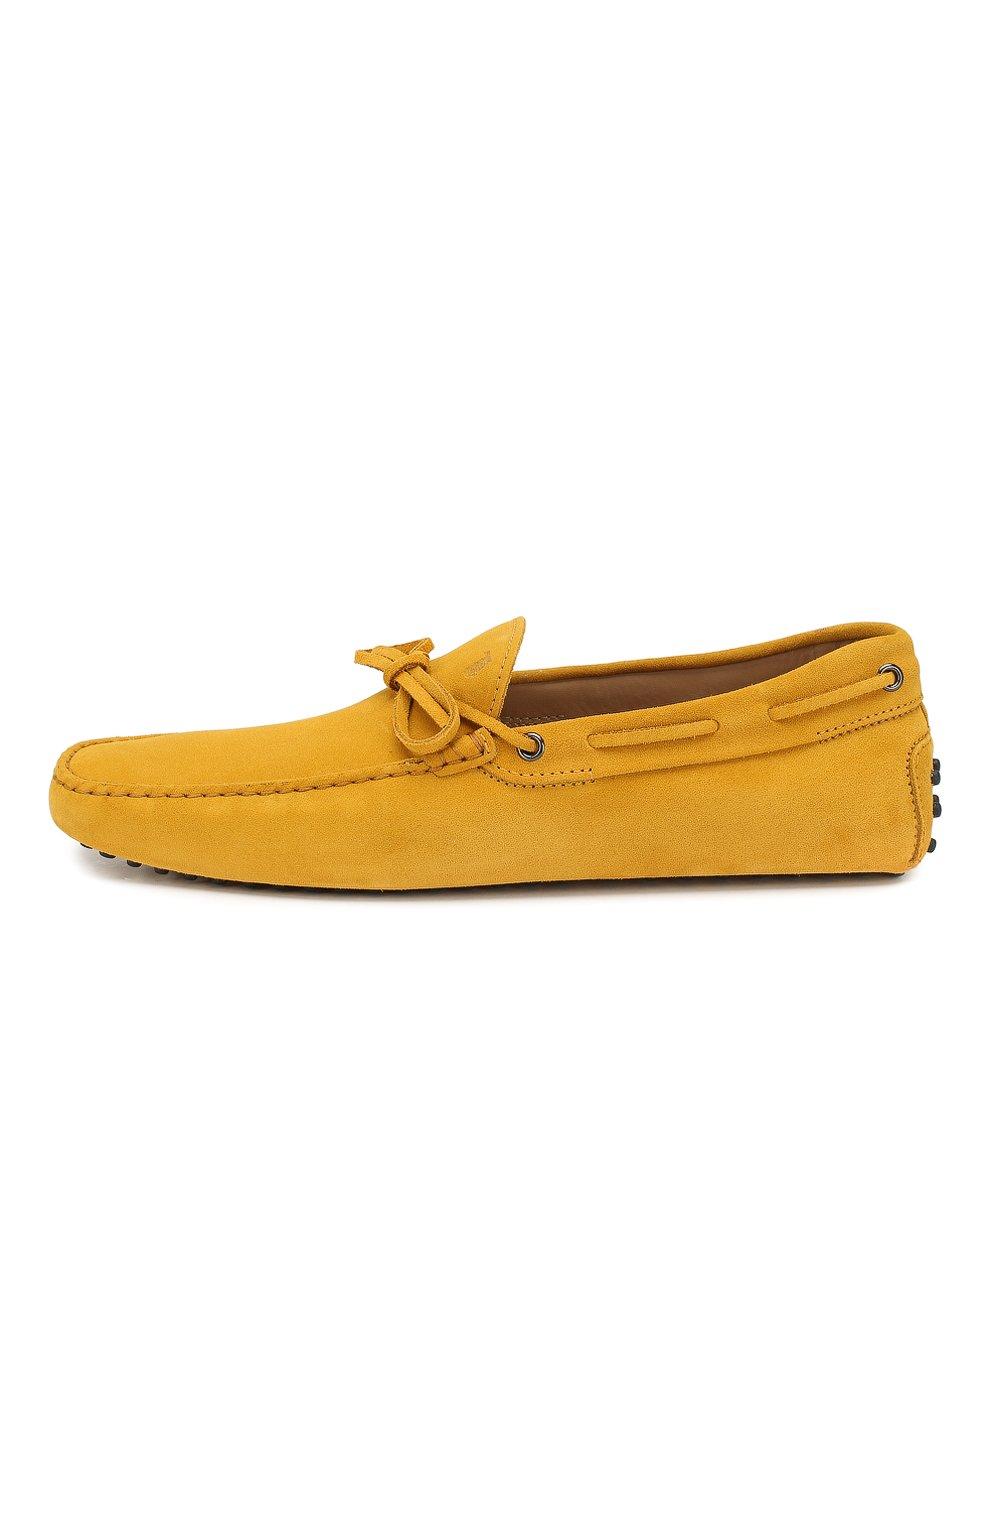 Замшевые мокасины Gommino Driver Tod's желтые | Фото №3